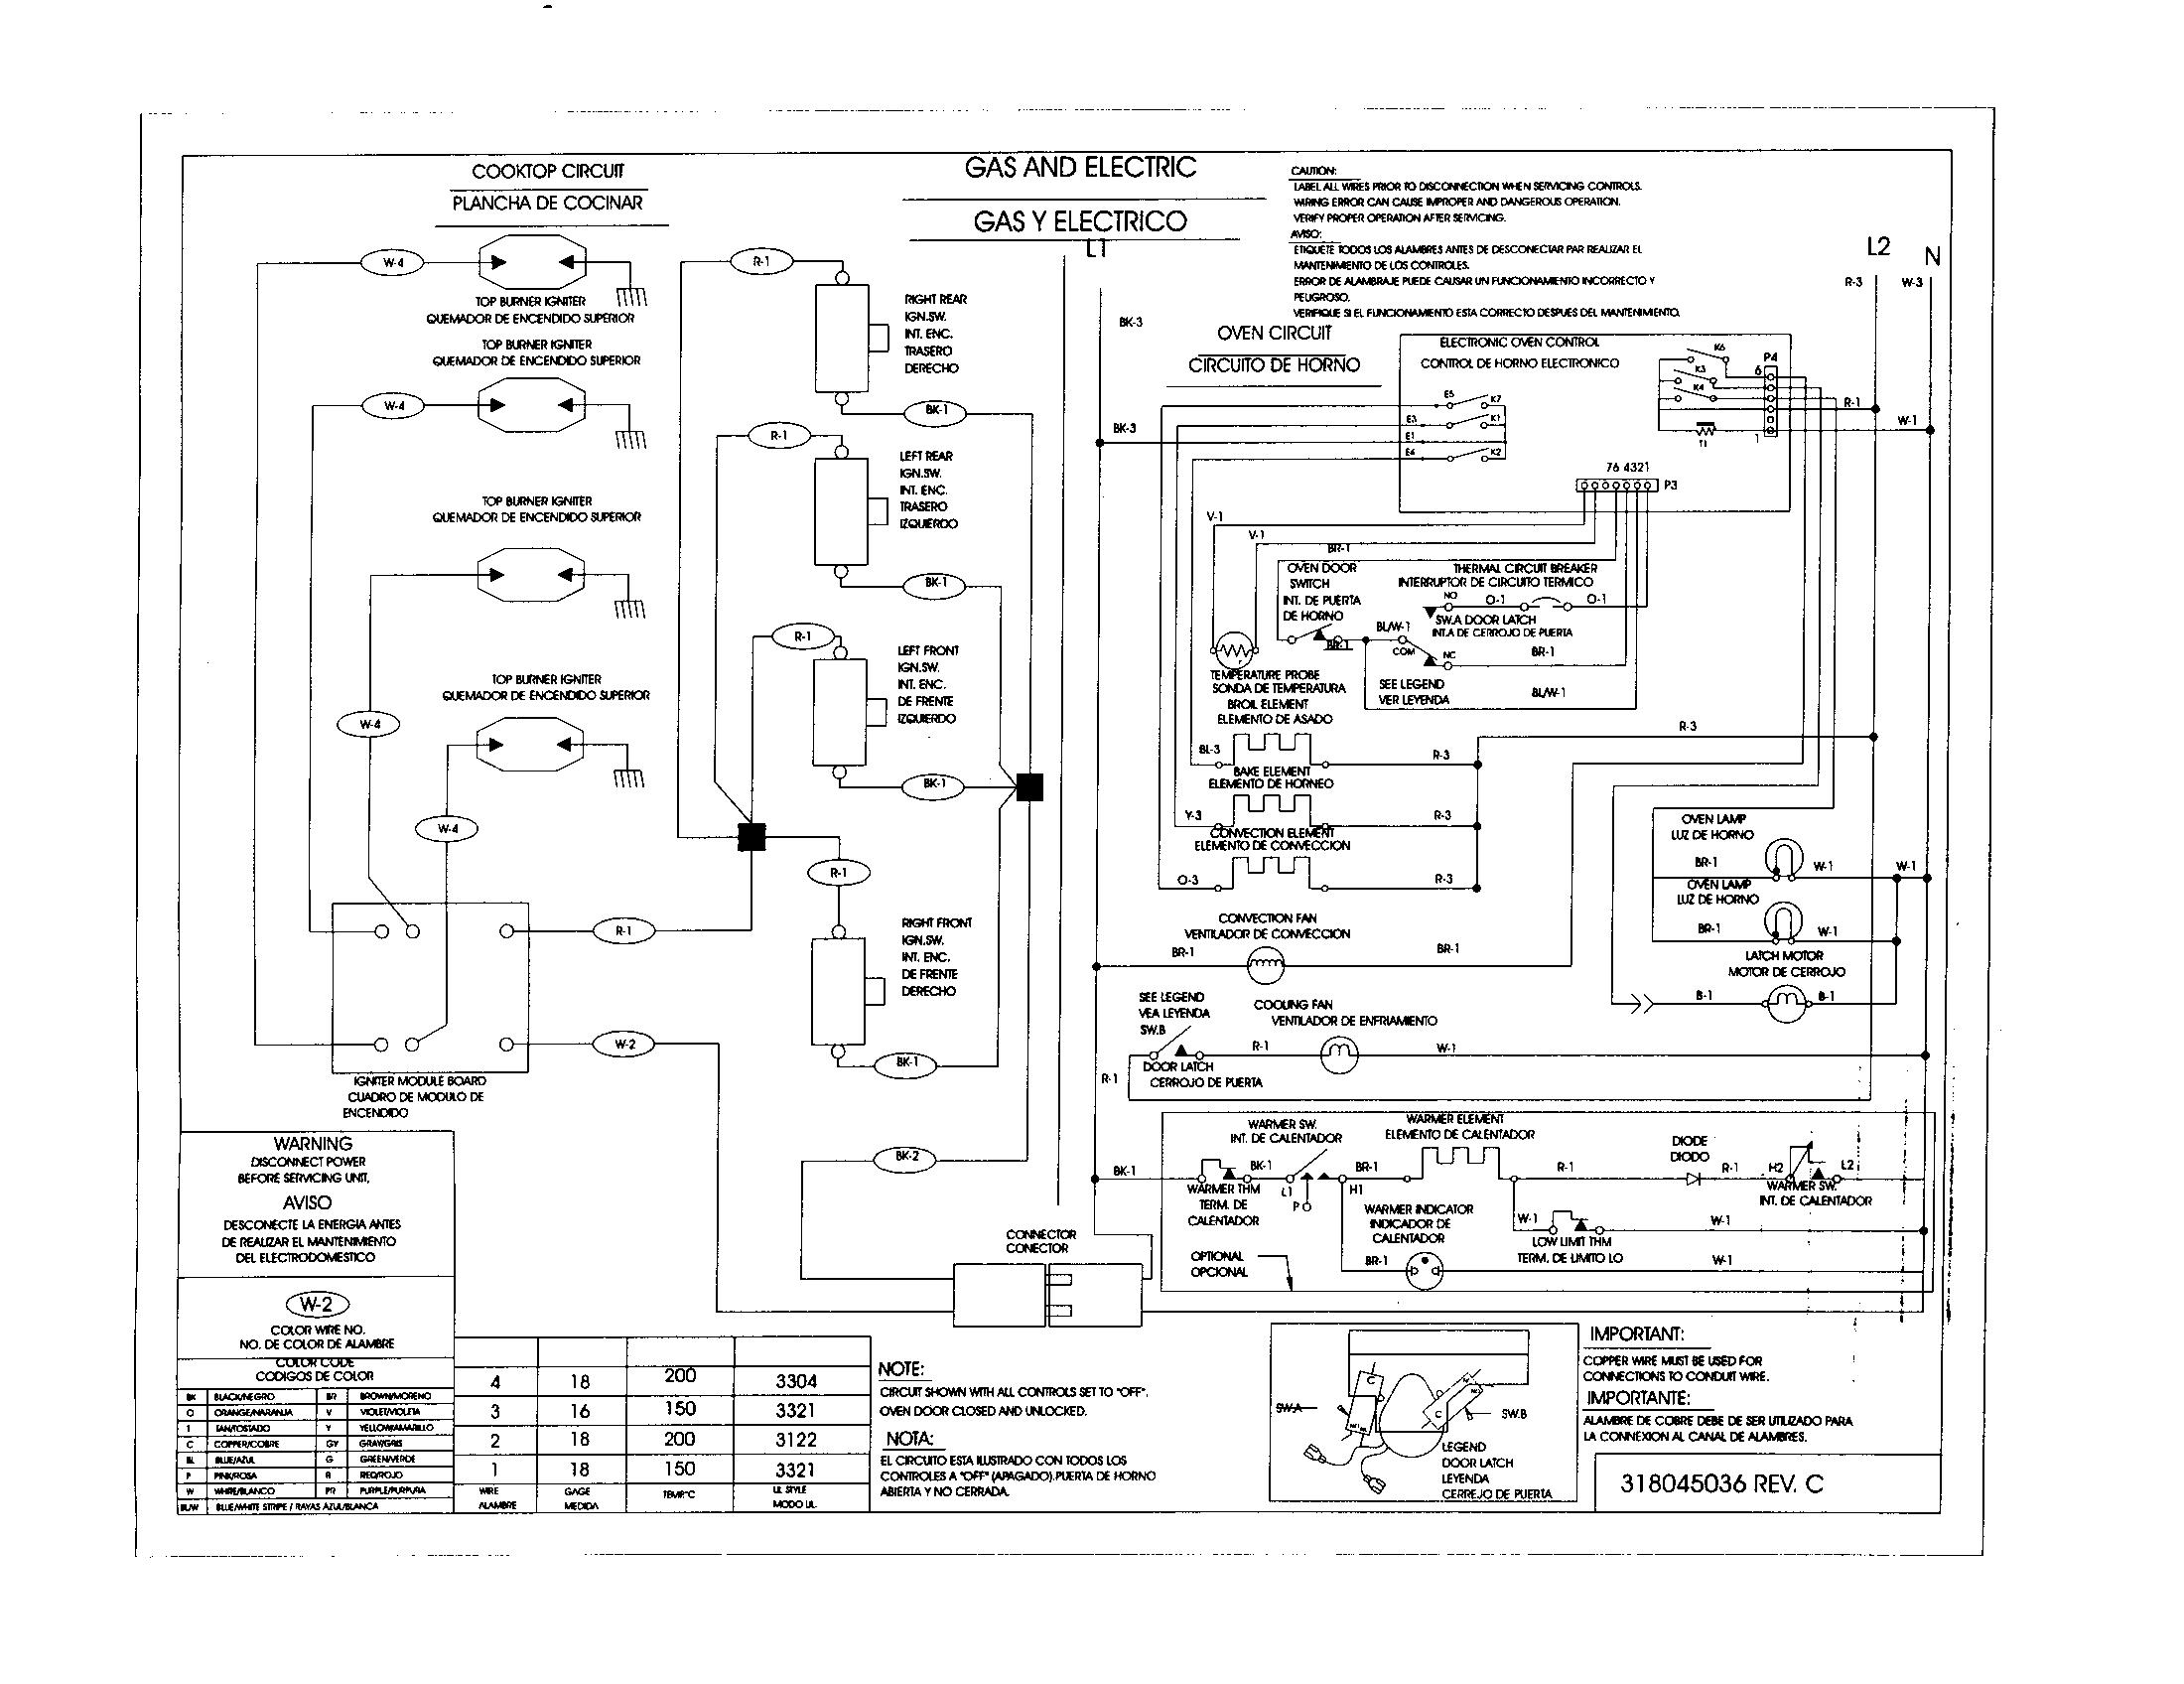 Llv Wiring Diagram 88 Easy Rules Of Fuel Pump Relay Wire Online Schematics Rh Delvato Co 1996 Chevy S10